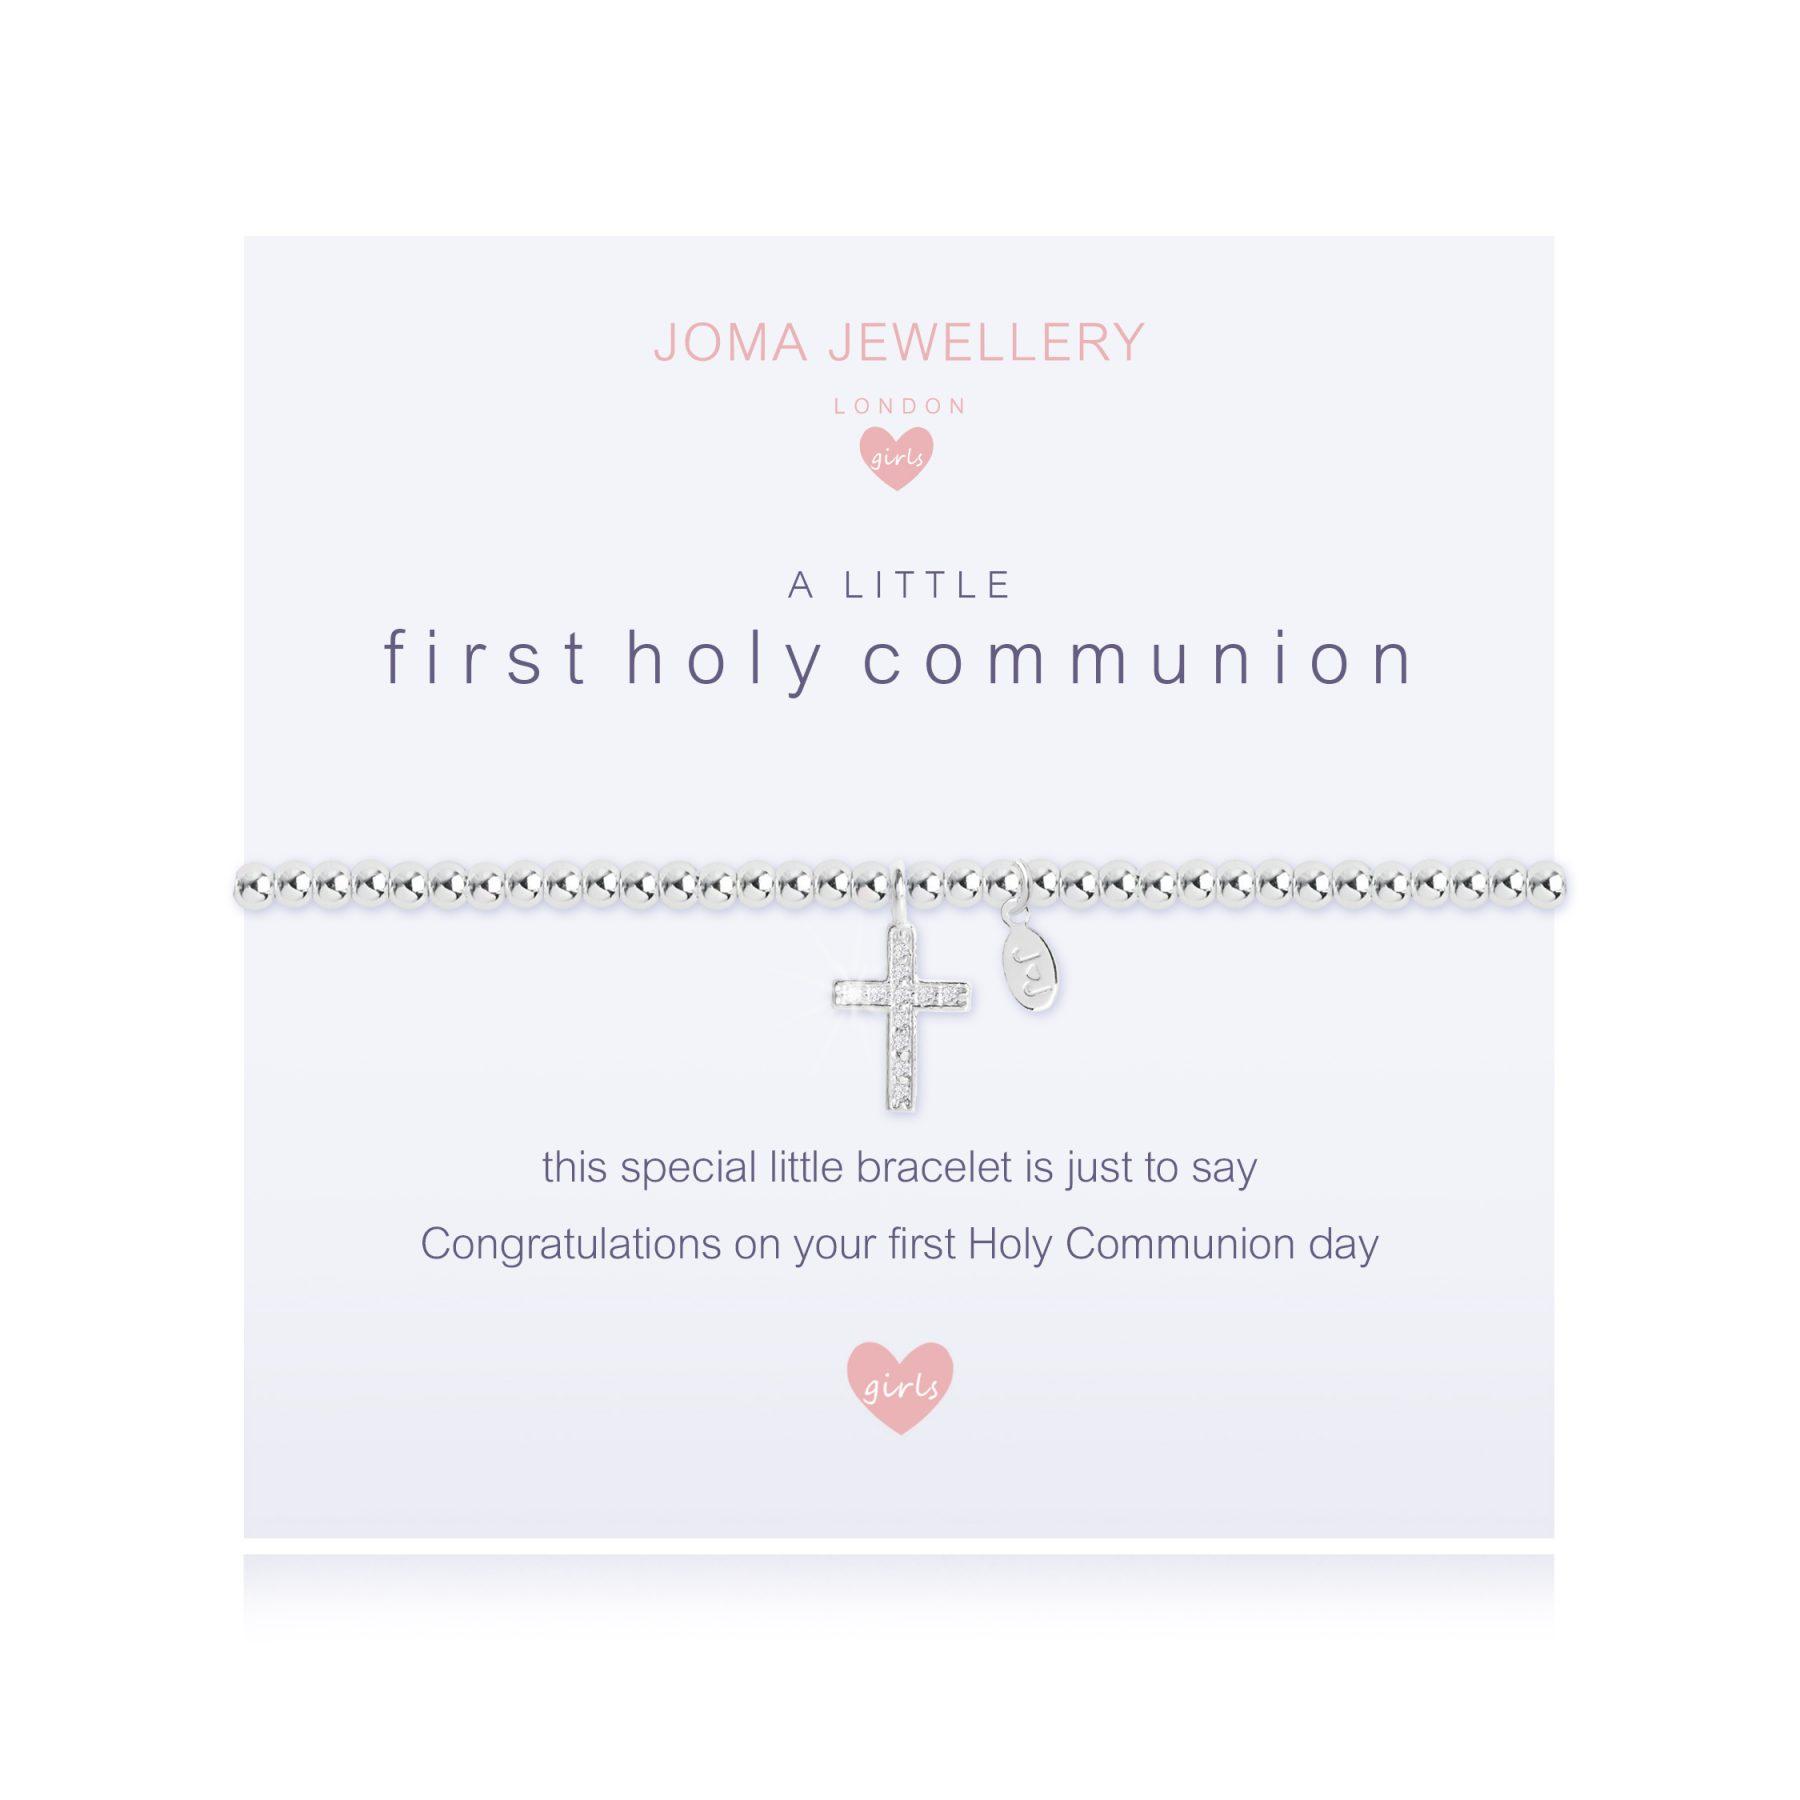 Joma Jewellery A Little Girls First Holy Communion Bracelet